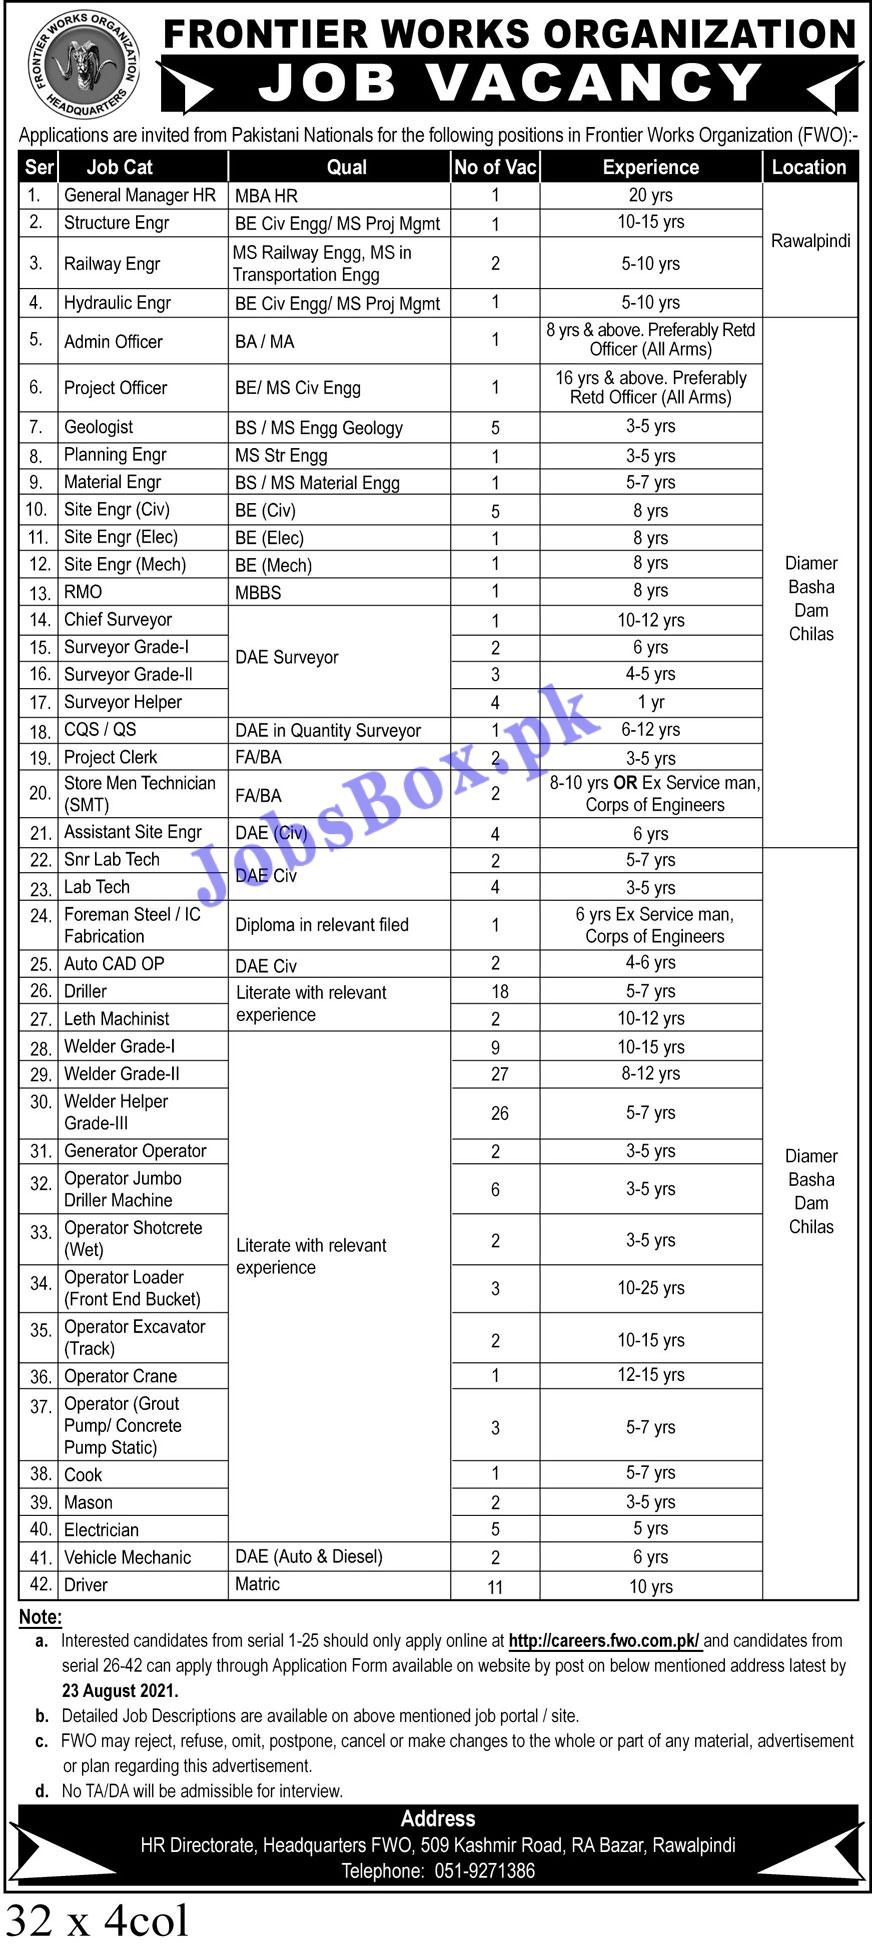 https://careers.fwo.com.pk - Frontier Works Organization FWO Jobs 2021 in Pakistan